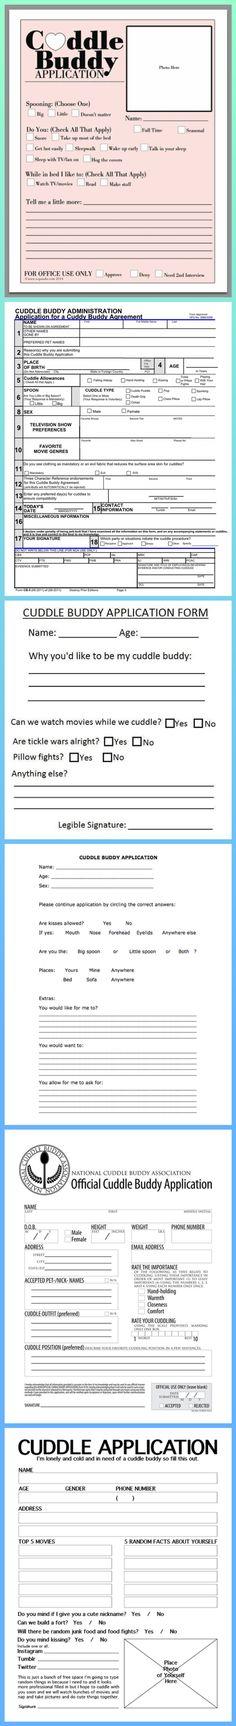 Cuddle Buddy Application Forms